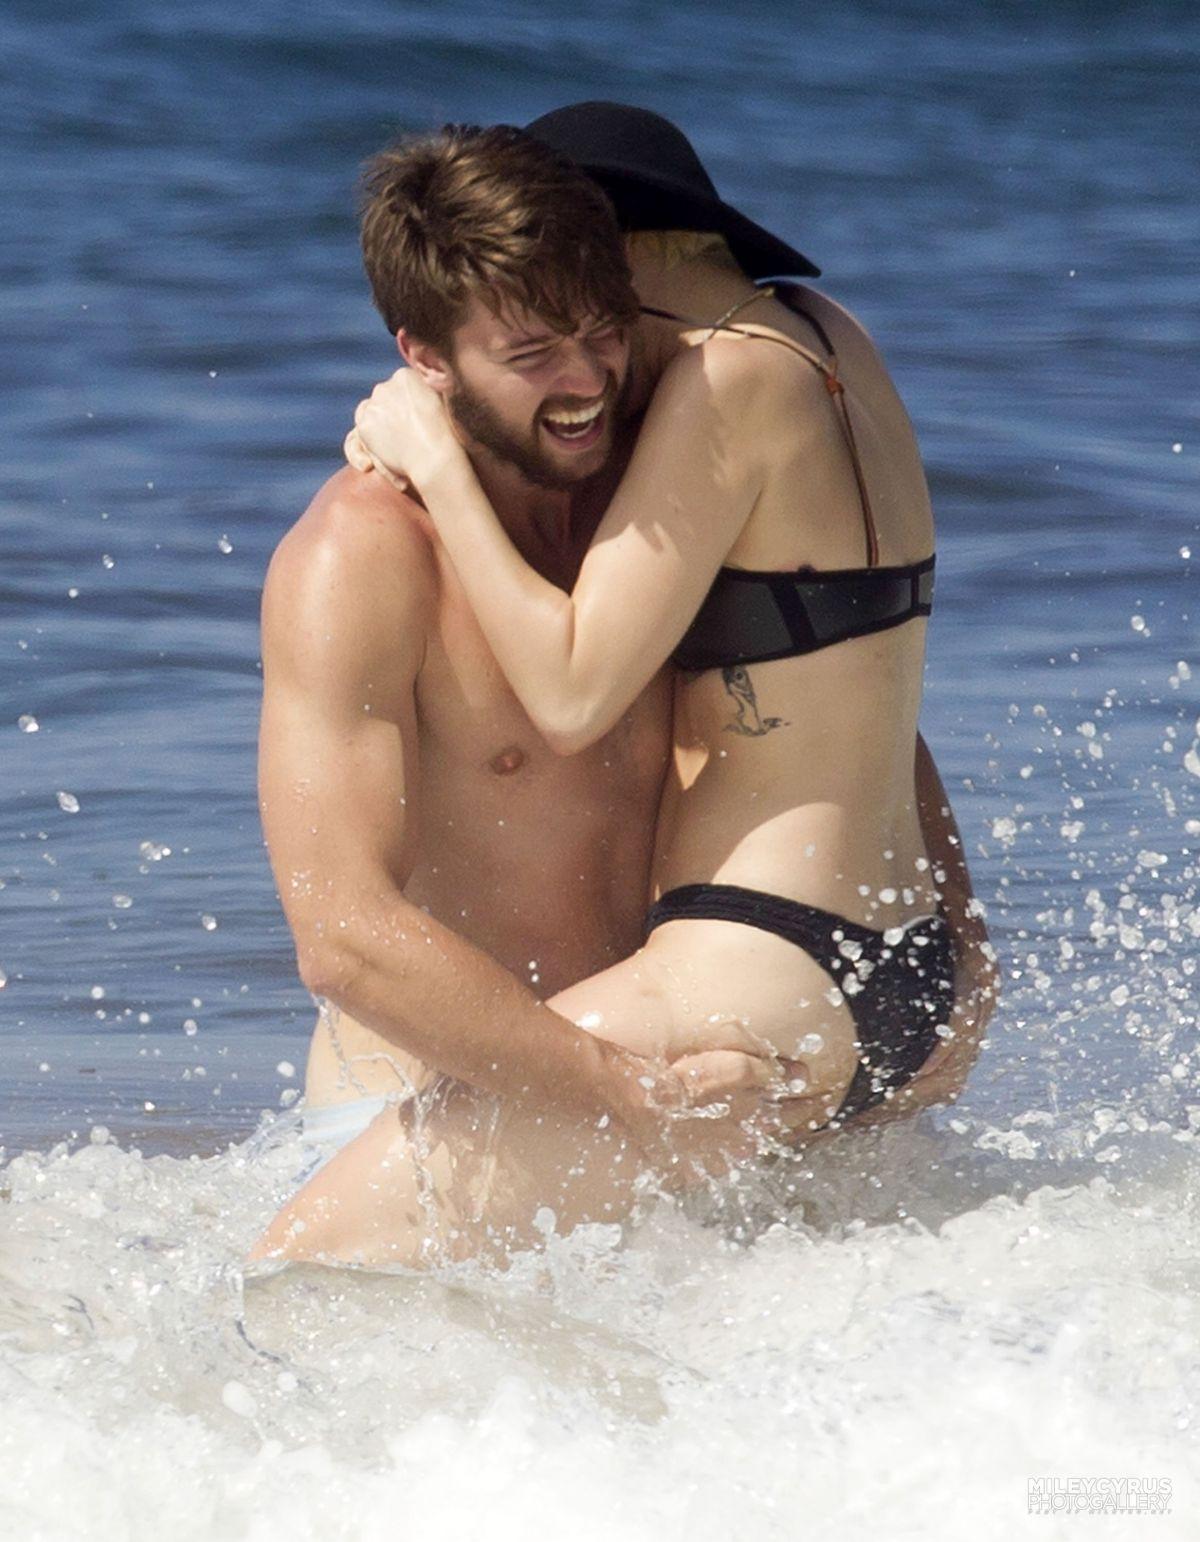 Miley crus bikini superphone, this